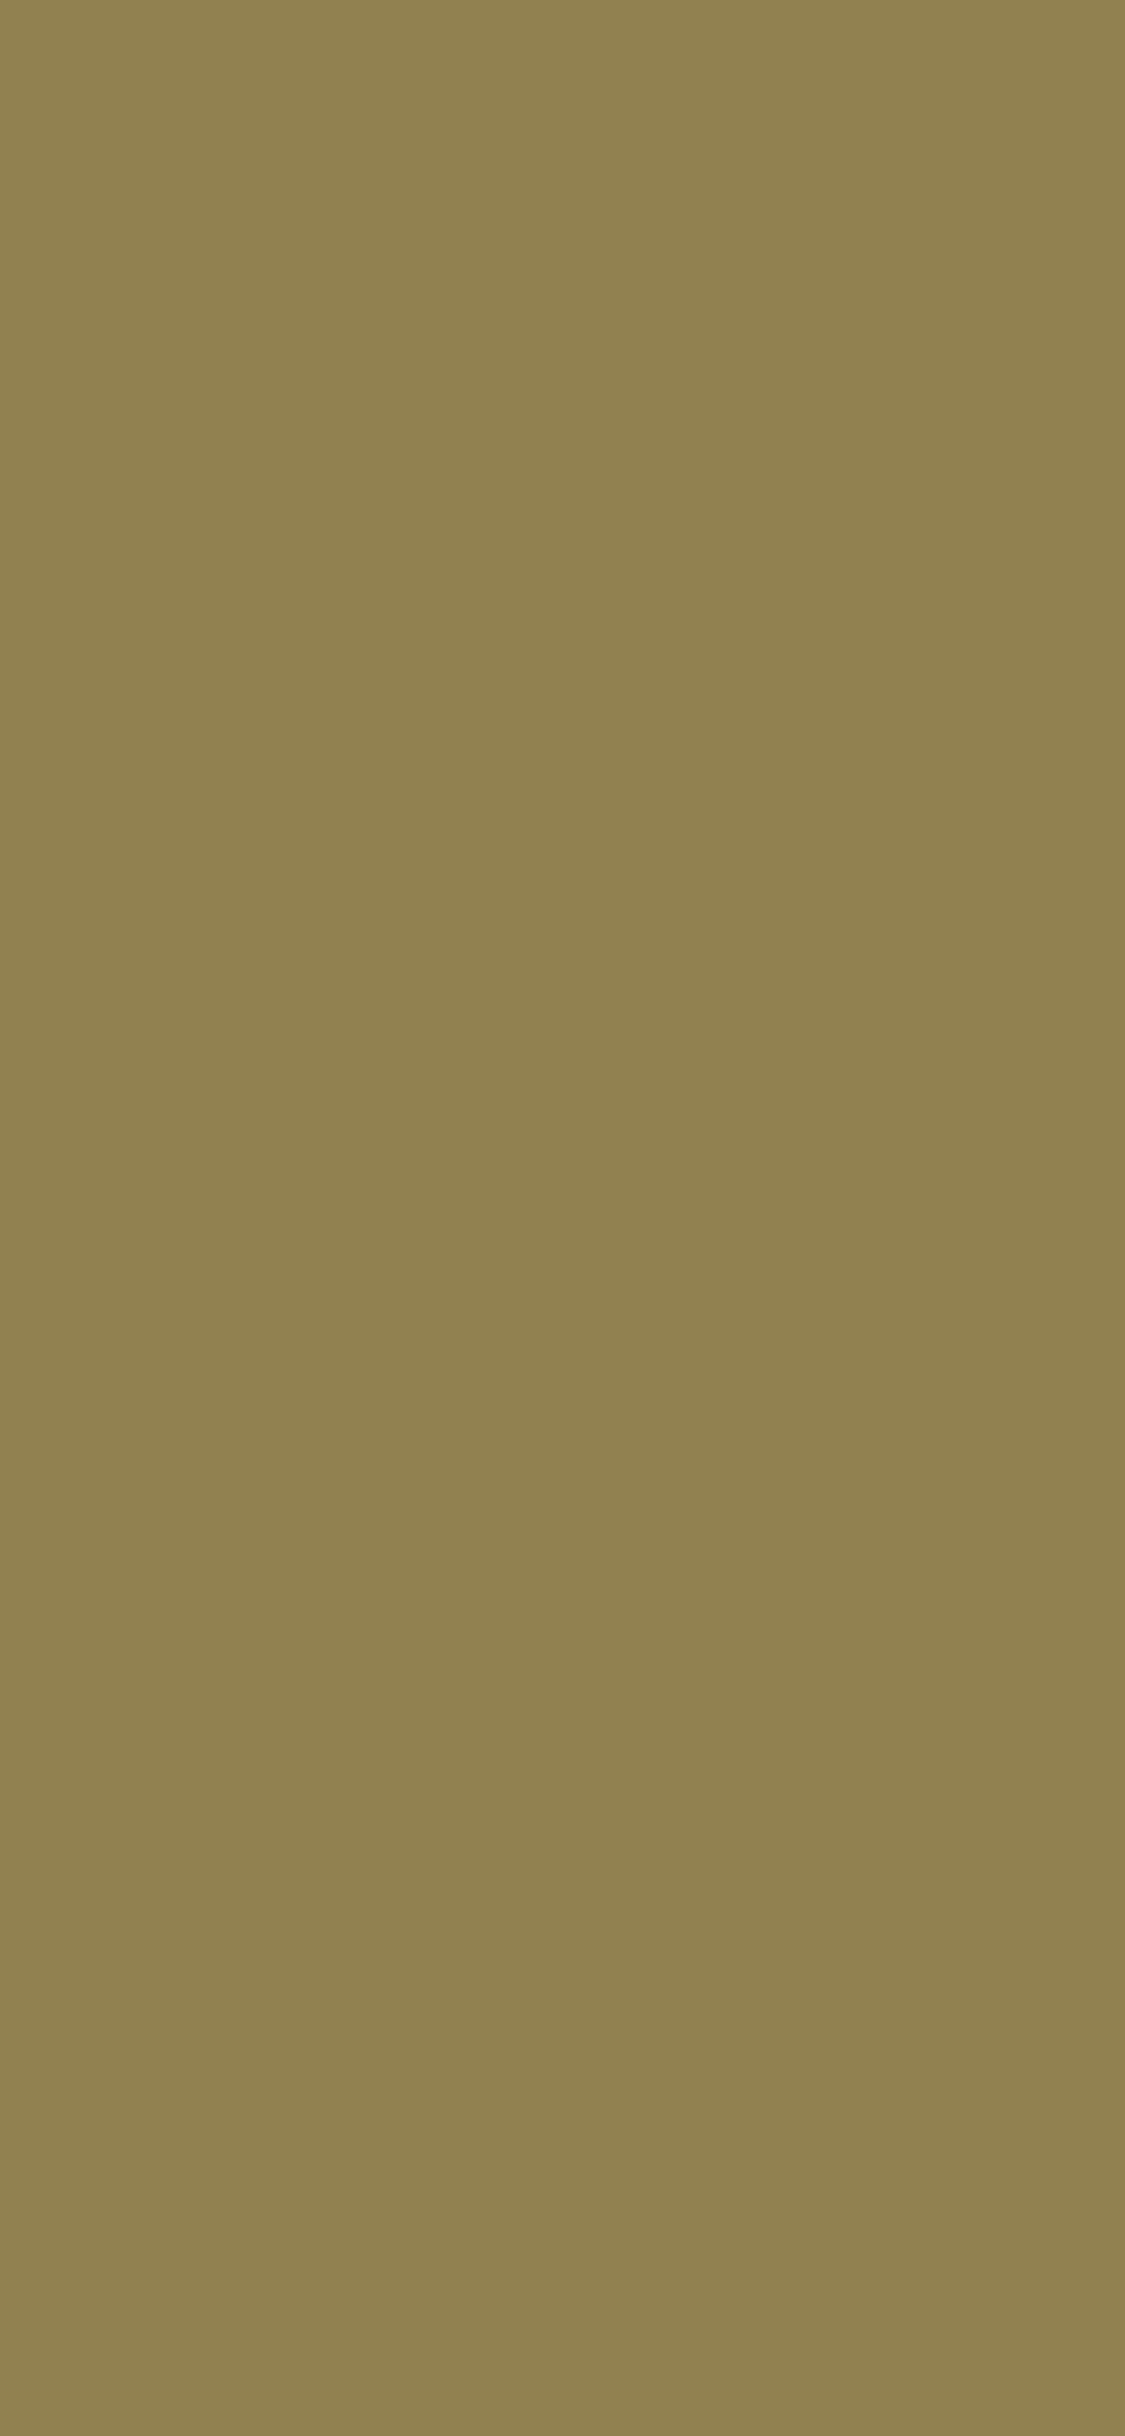 1125x2436 Dark Tan Solid Color Background